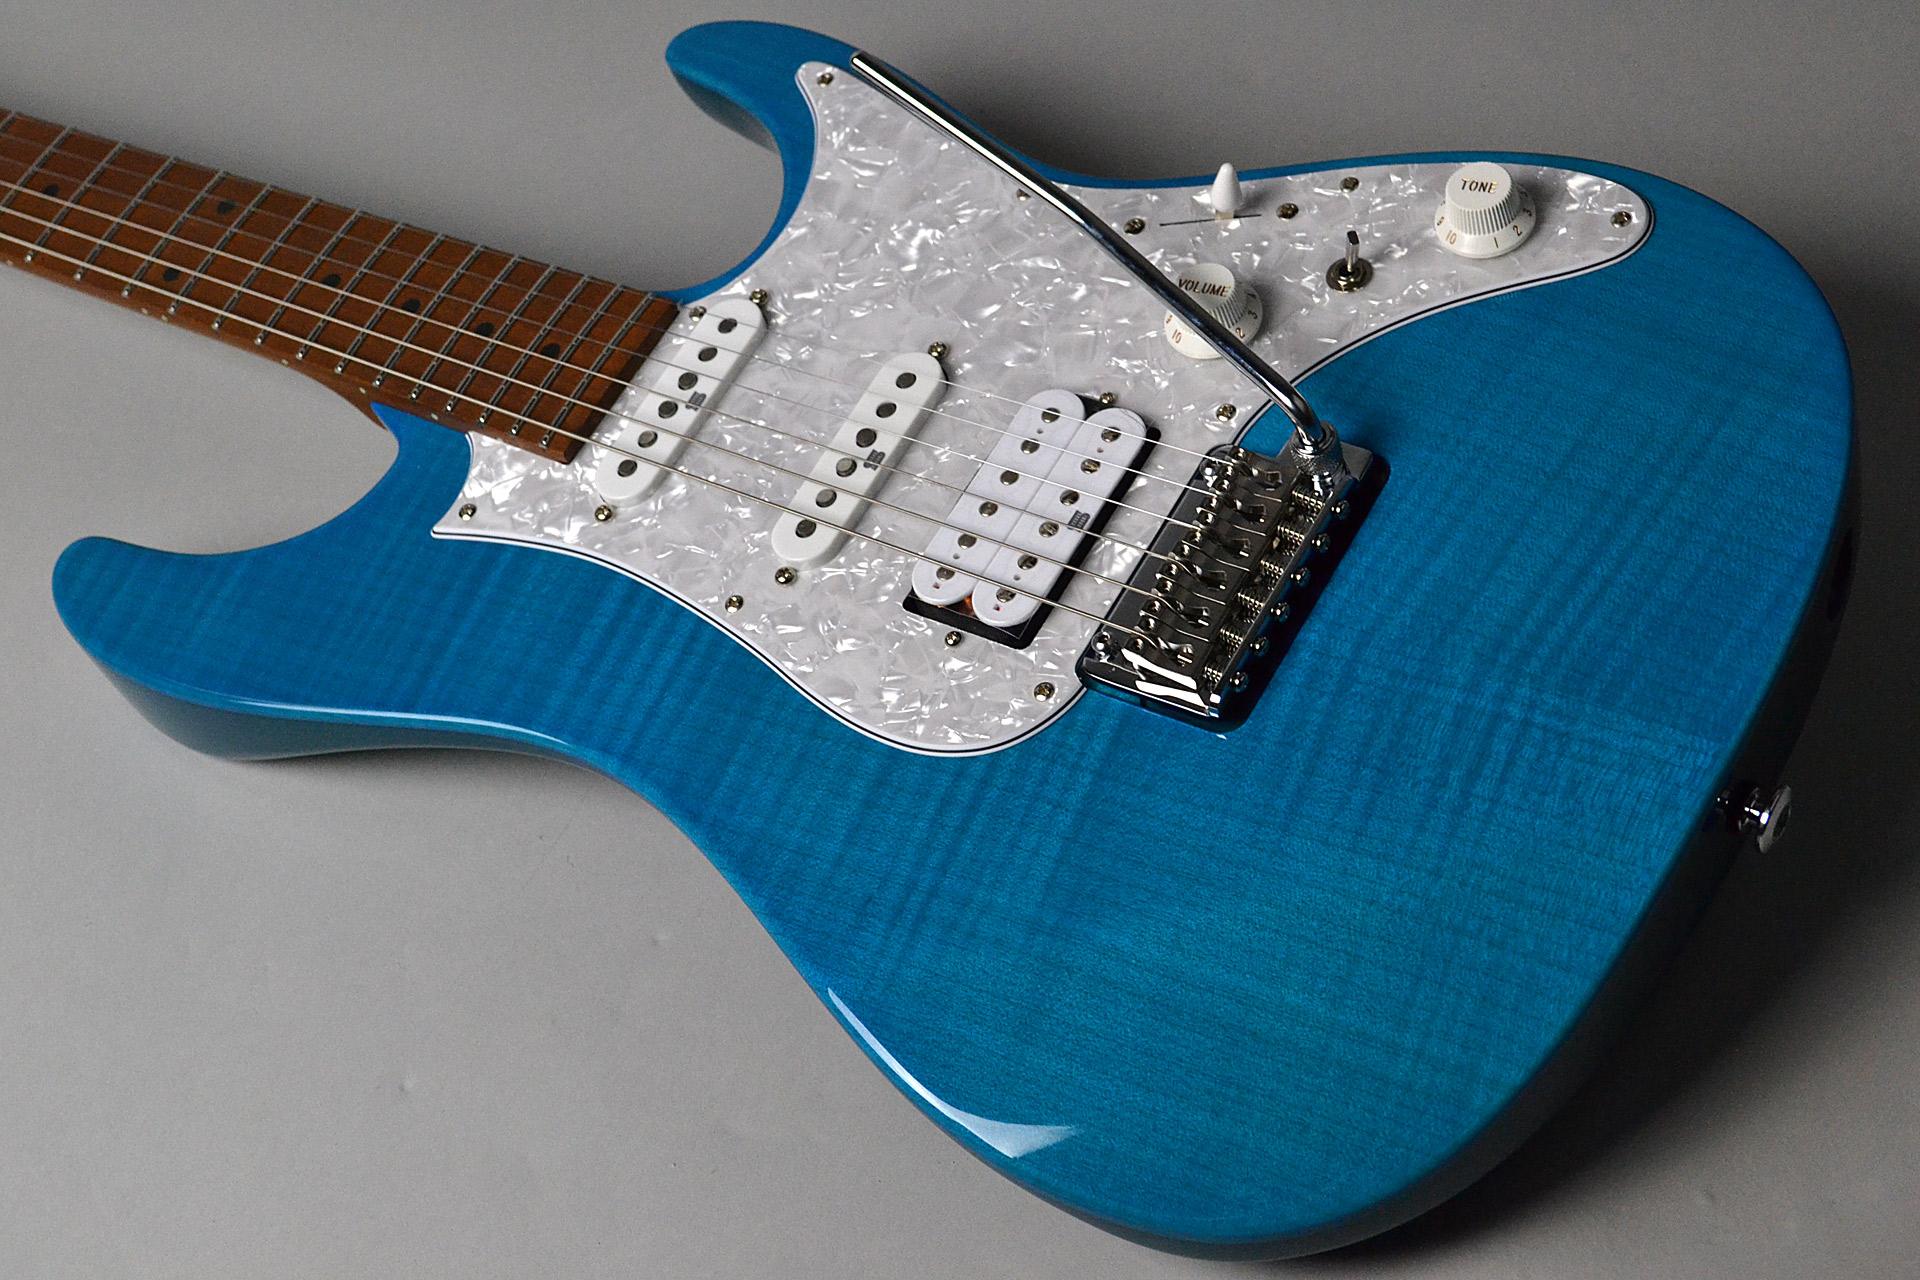 AZ2204F TAB Transparent Aqua Blueの全体画像(縦)